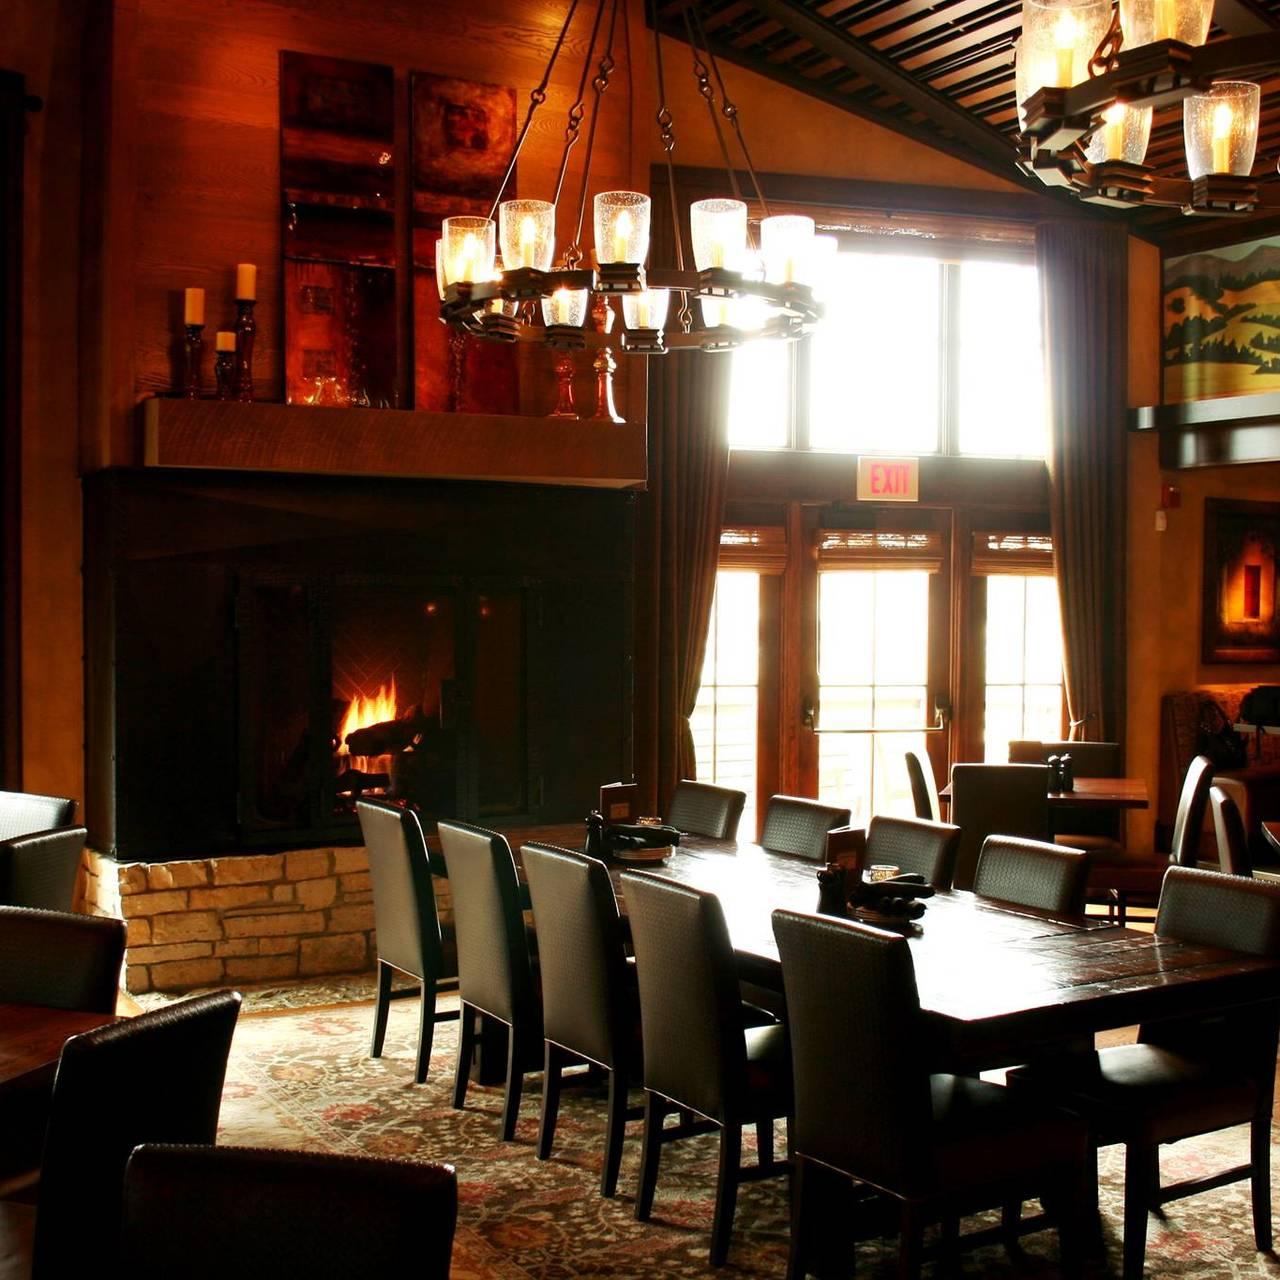 Porter Creek Hardwood Grill Restaurant - Fargo, ND | OpenTable